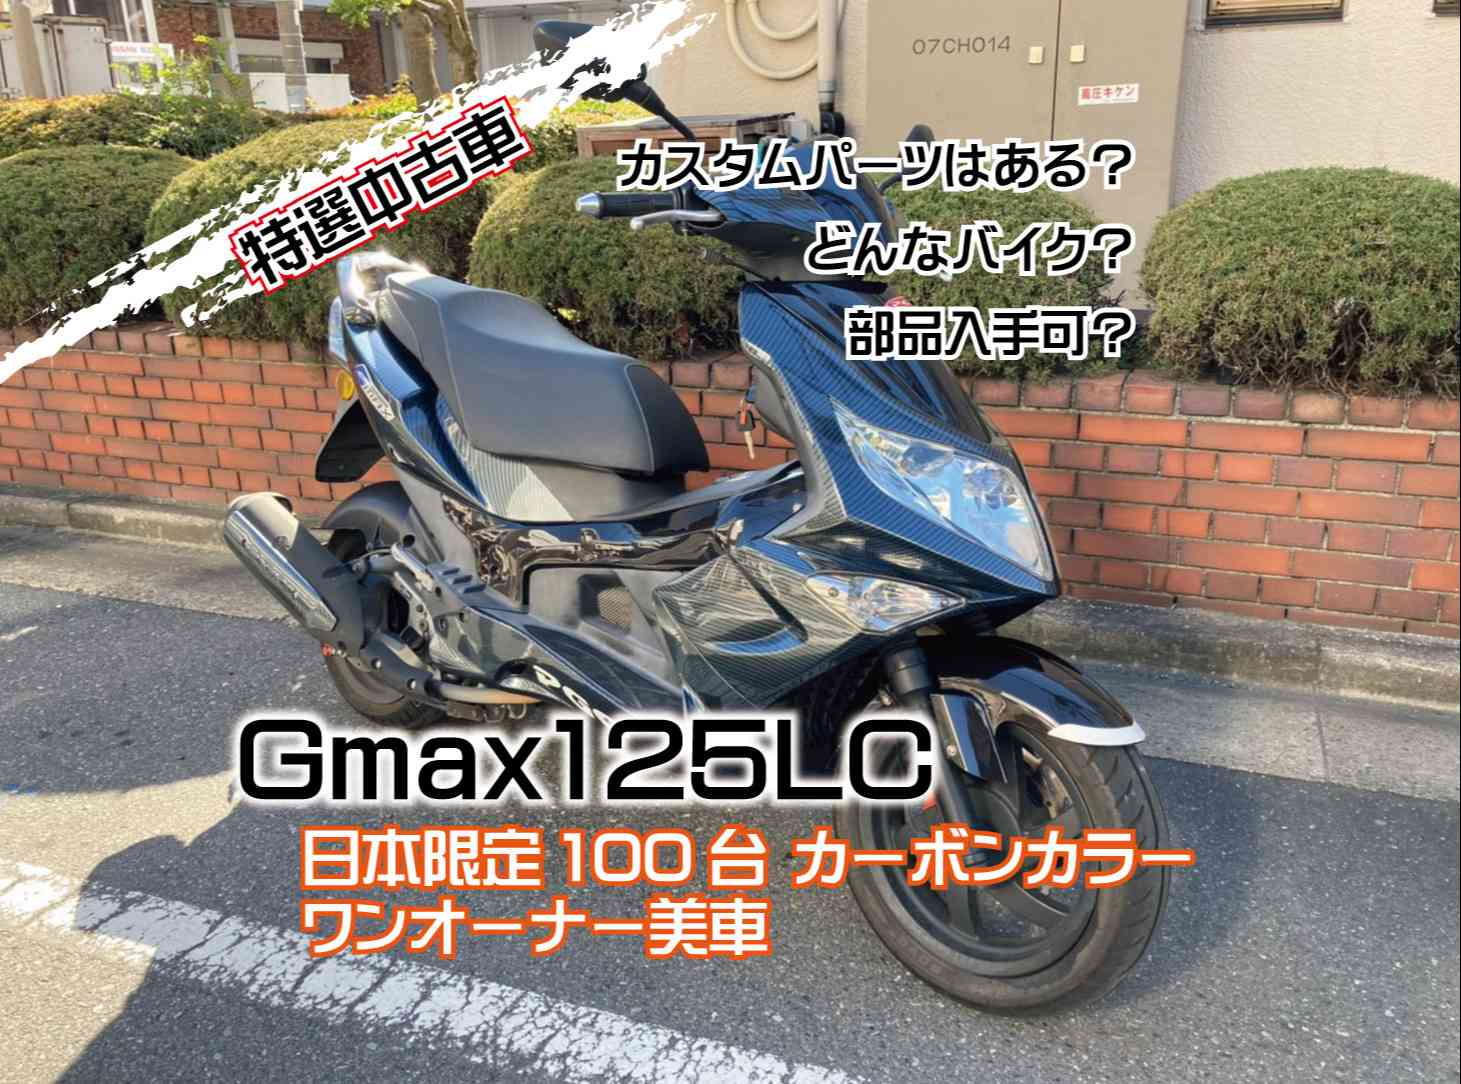 PGO Gmax125LC